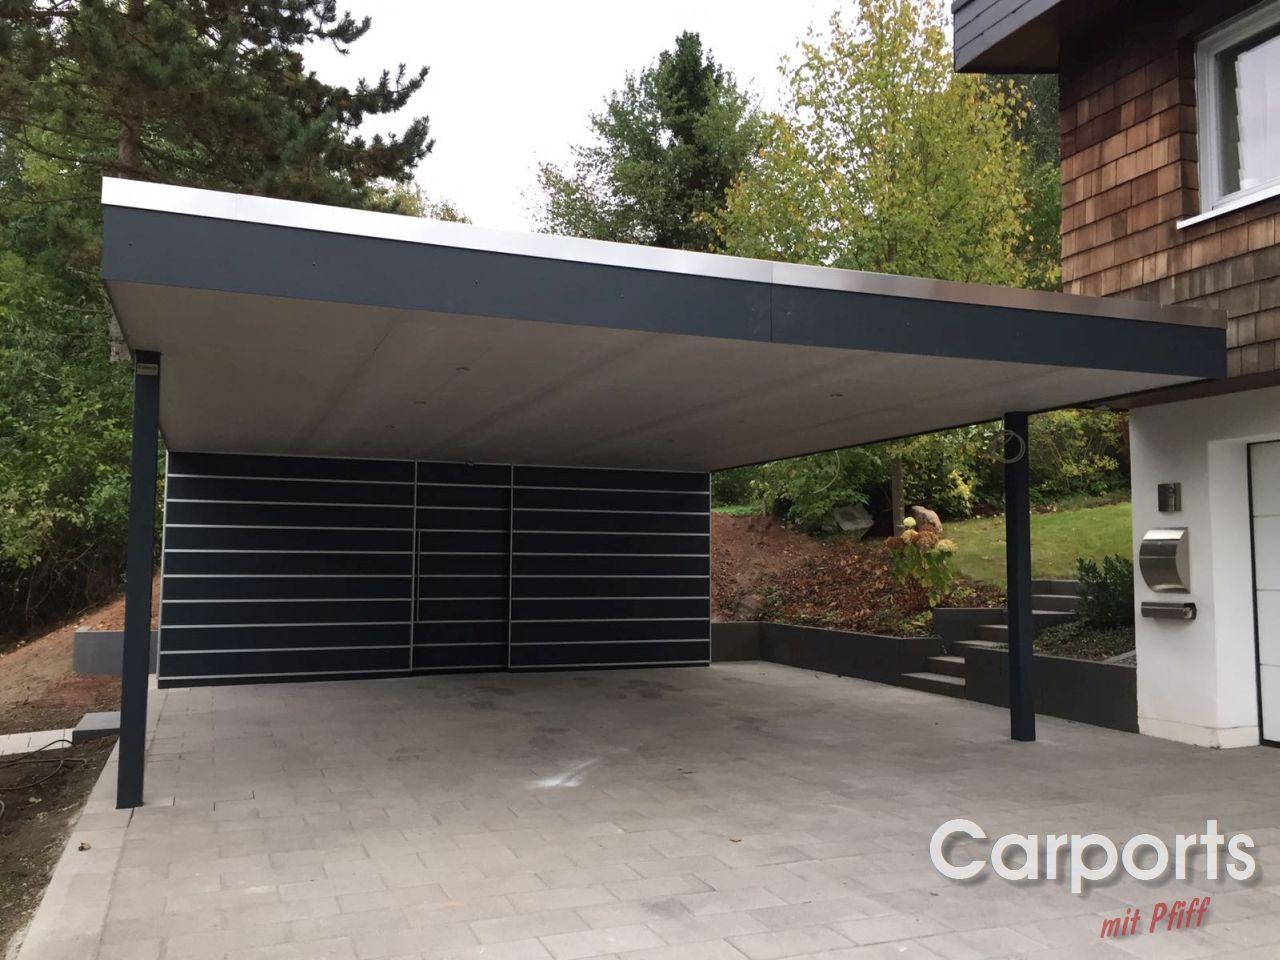 carport bauhaus trespa mit abstellraum carports mit pfiff carports mit pfiff. Black Bedroom Furniture Sets. Home Design Ideas